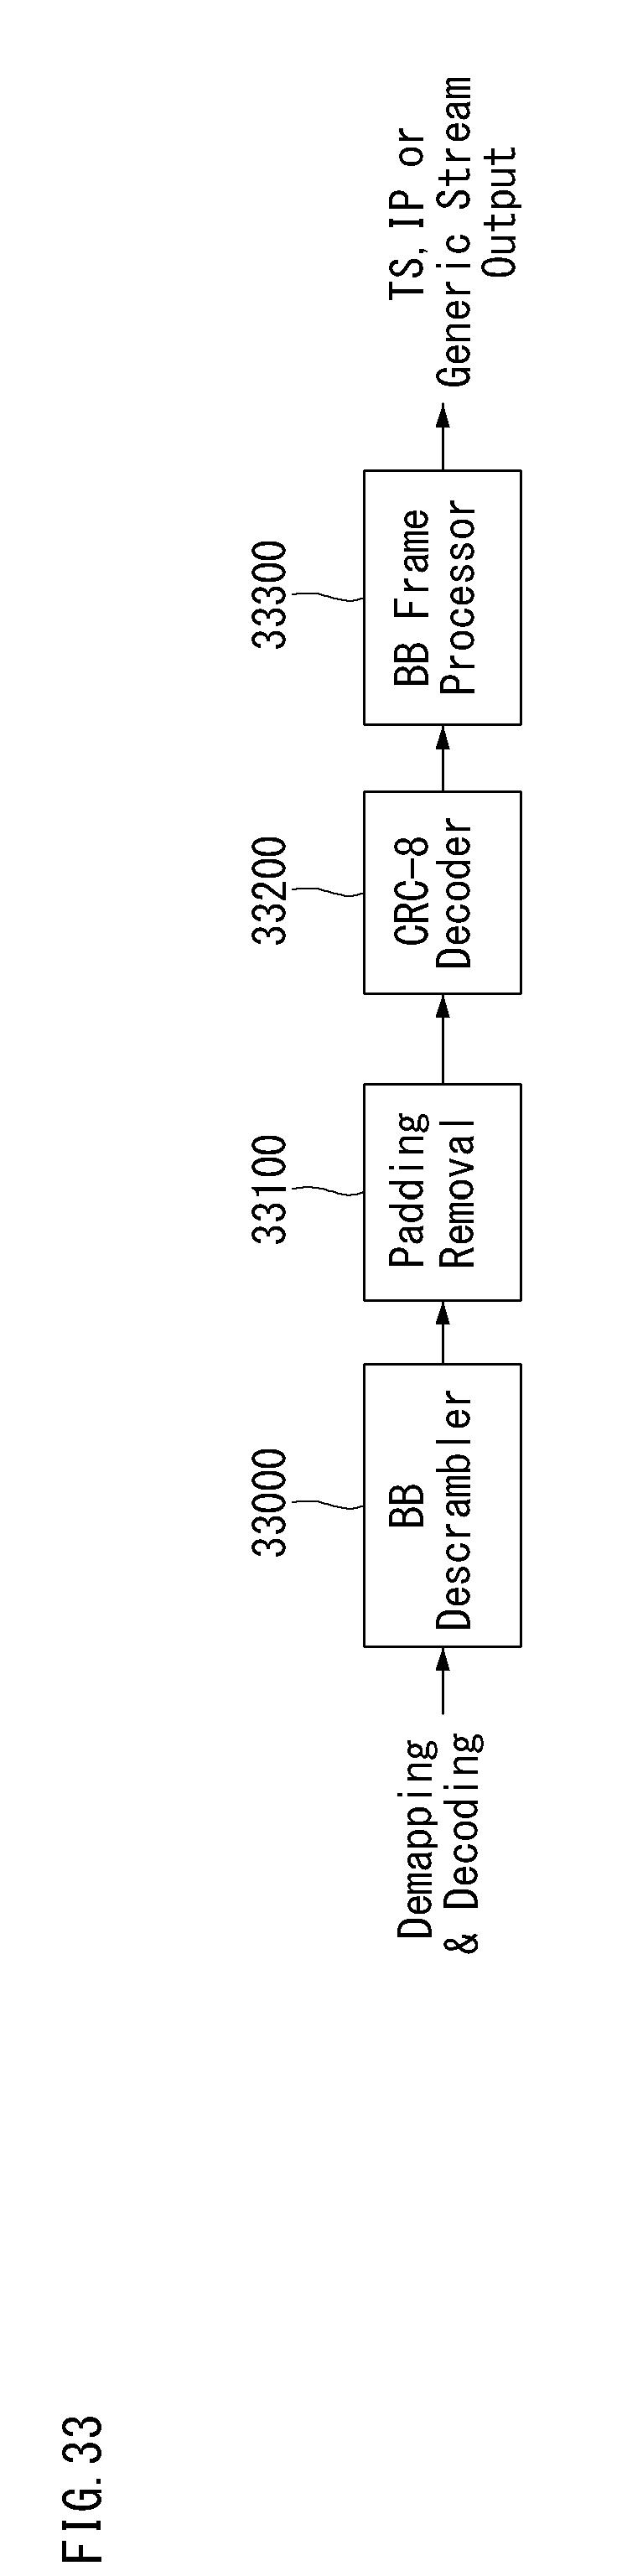 Patent US 10,263,822 B2